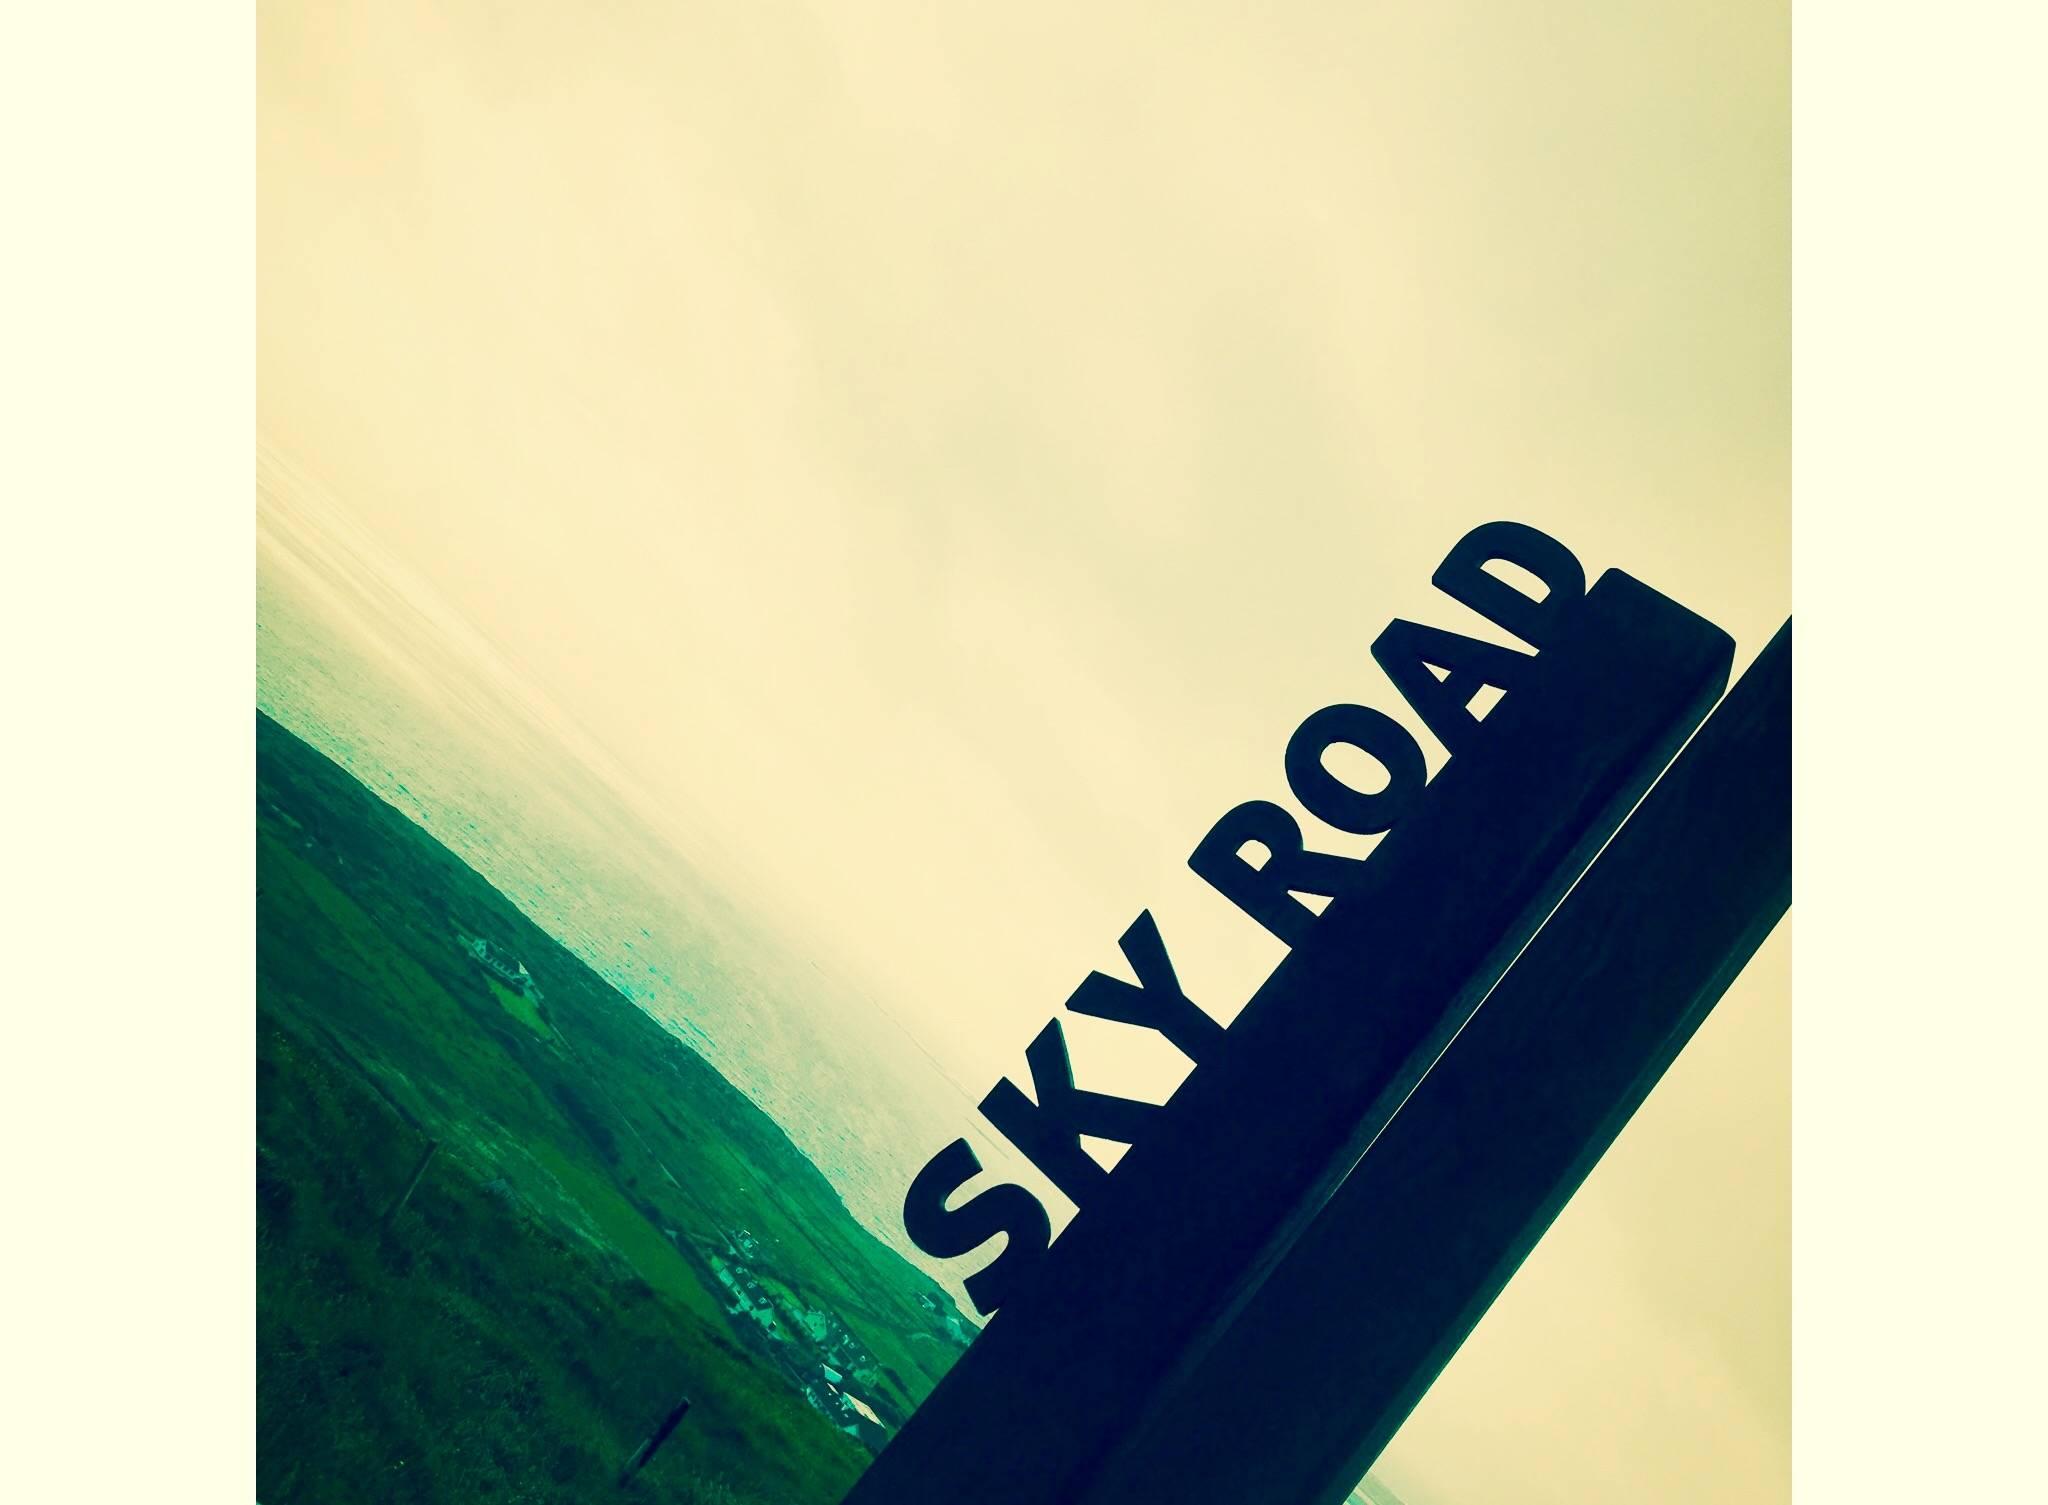 Photo 1: Sky road, Irland